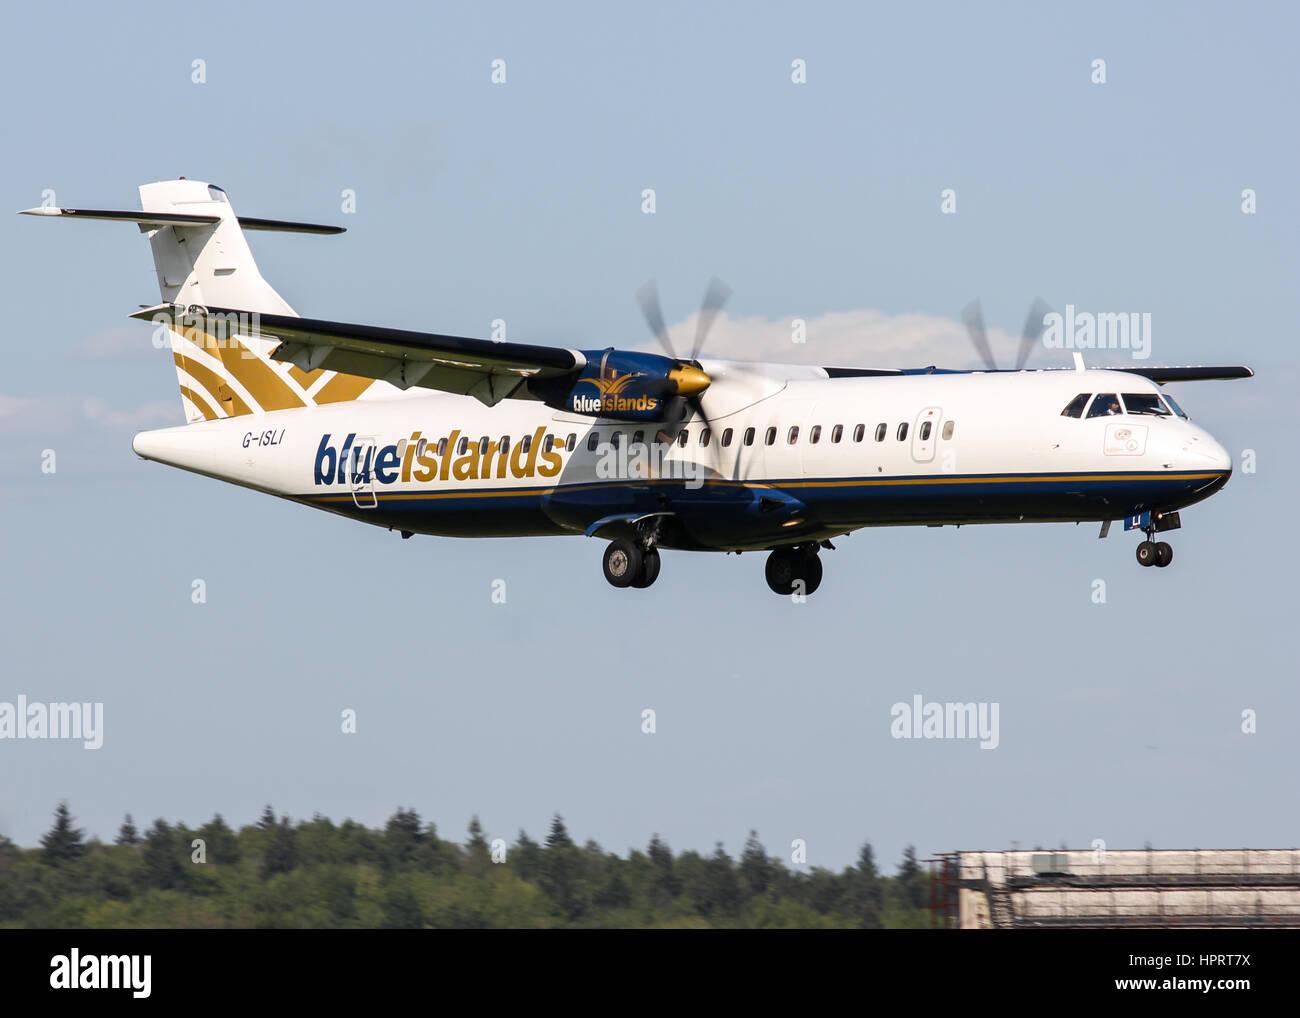 Blue Islands ATR 72-212 G-ISLI landing at Southampton Airport - Stock Image